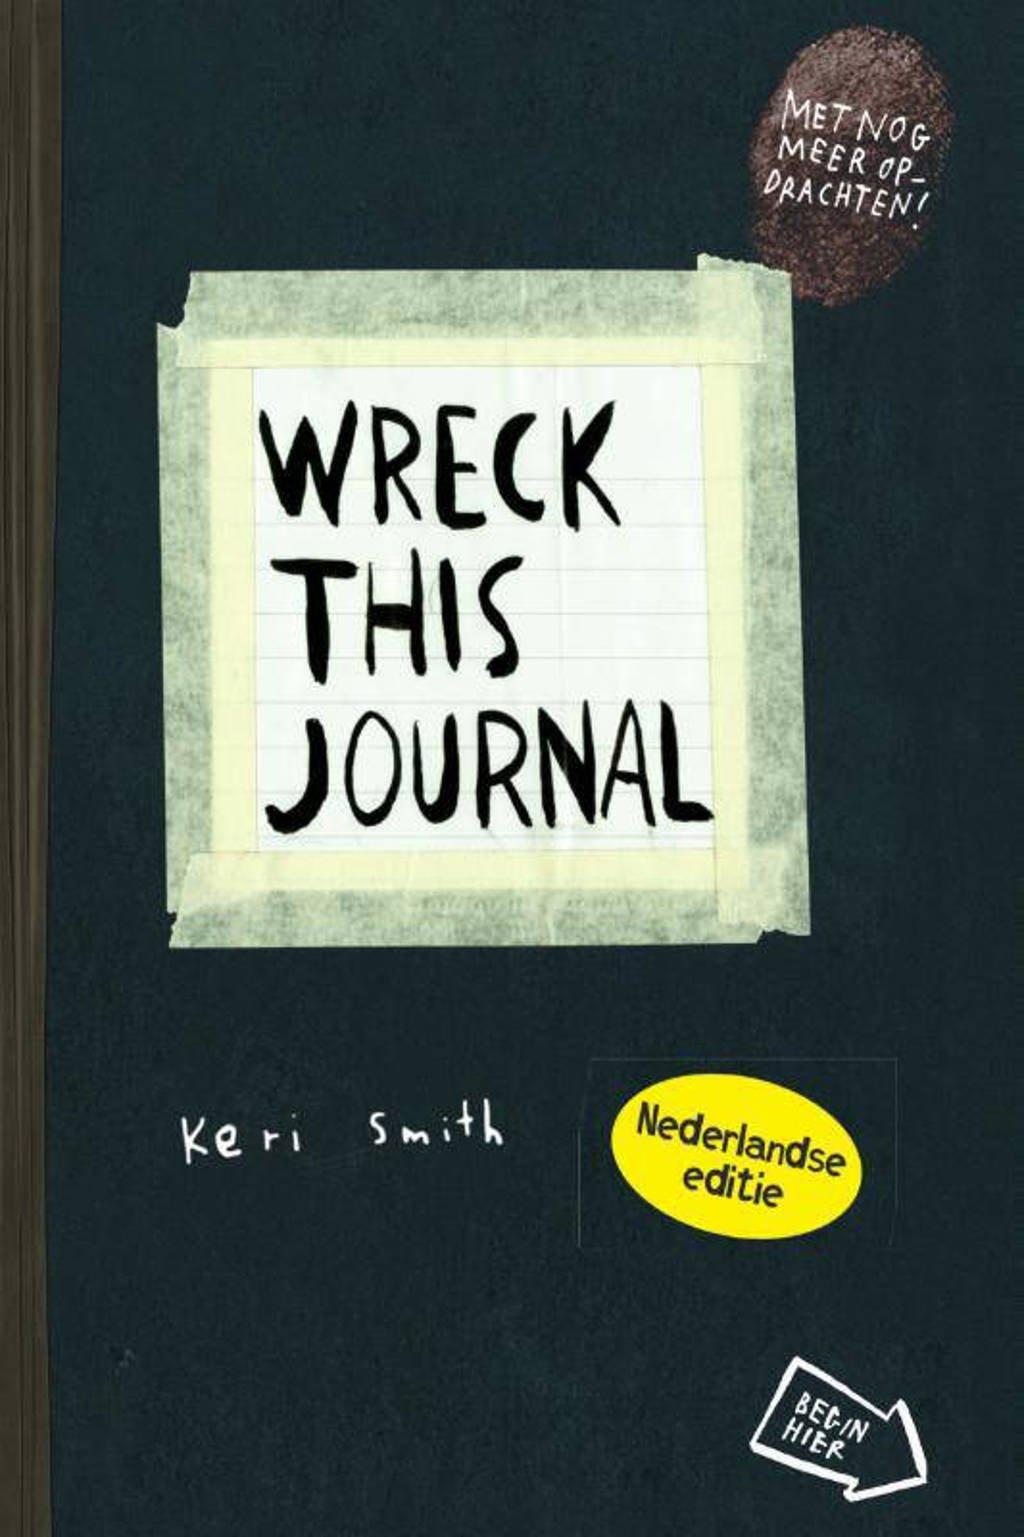 Wreck this journal: Wreck this journal - Keri Smith